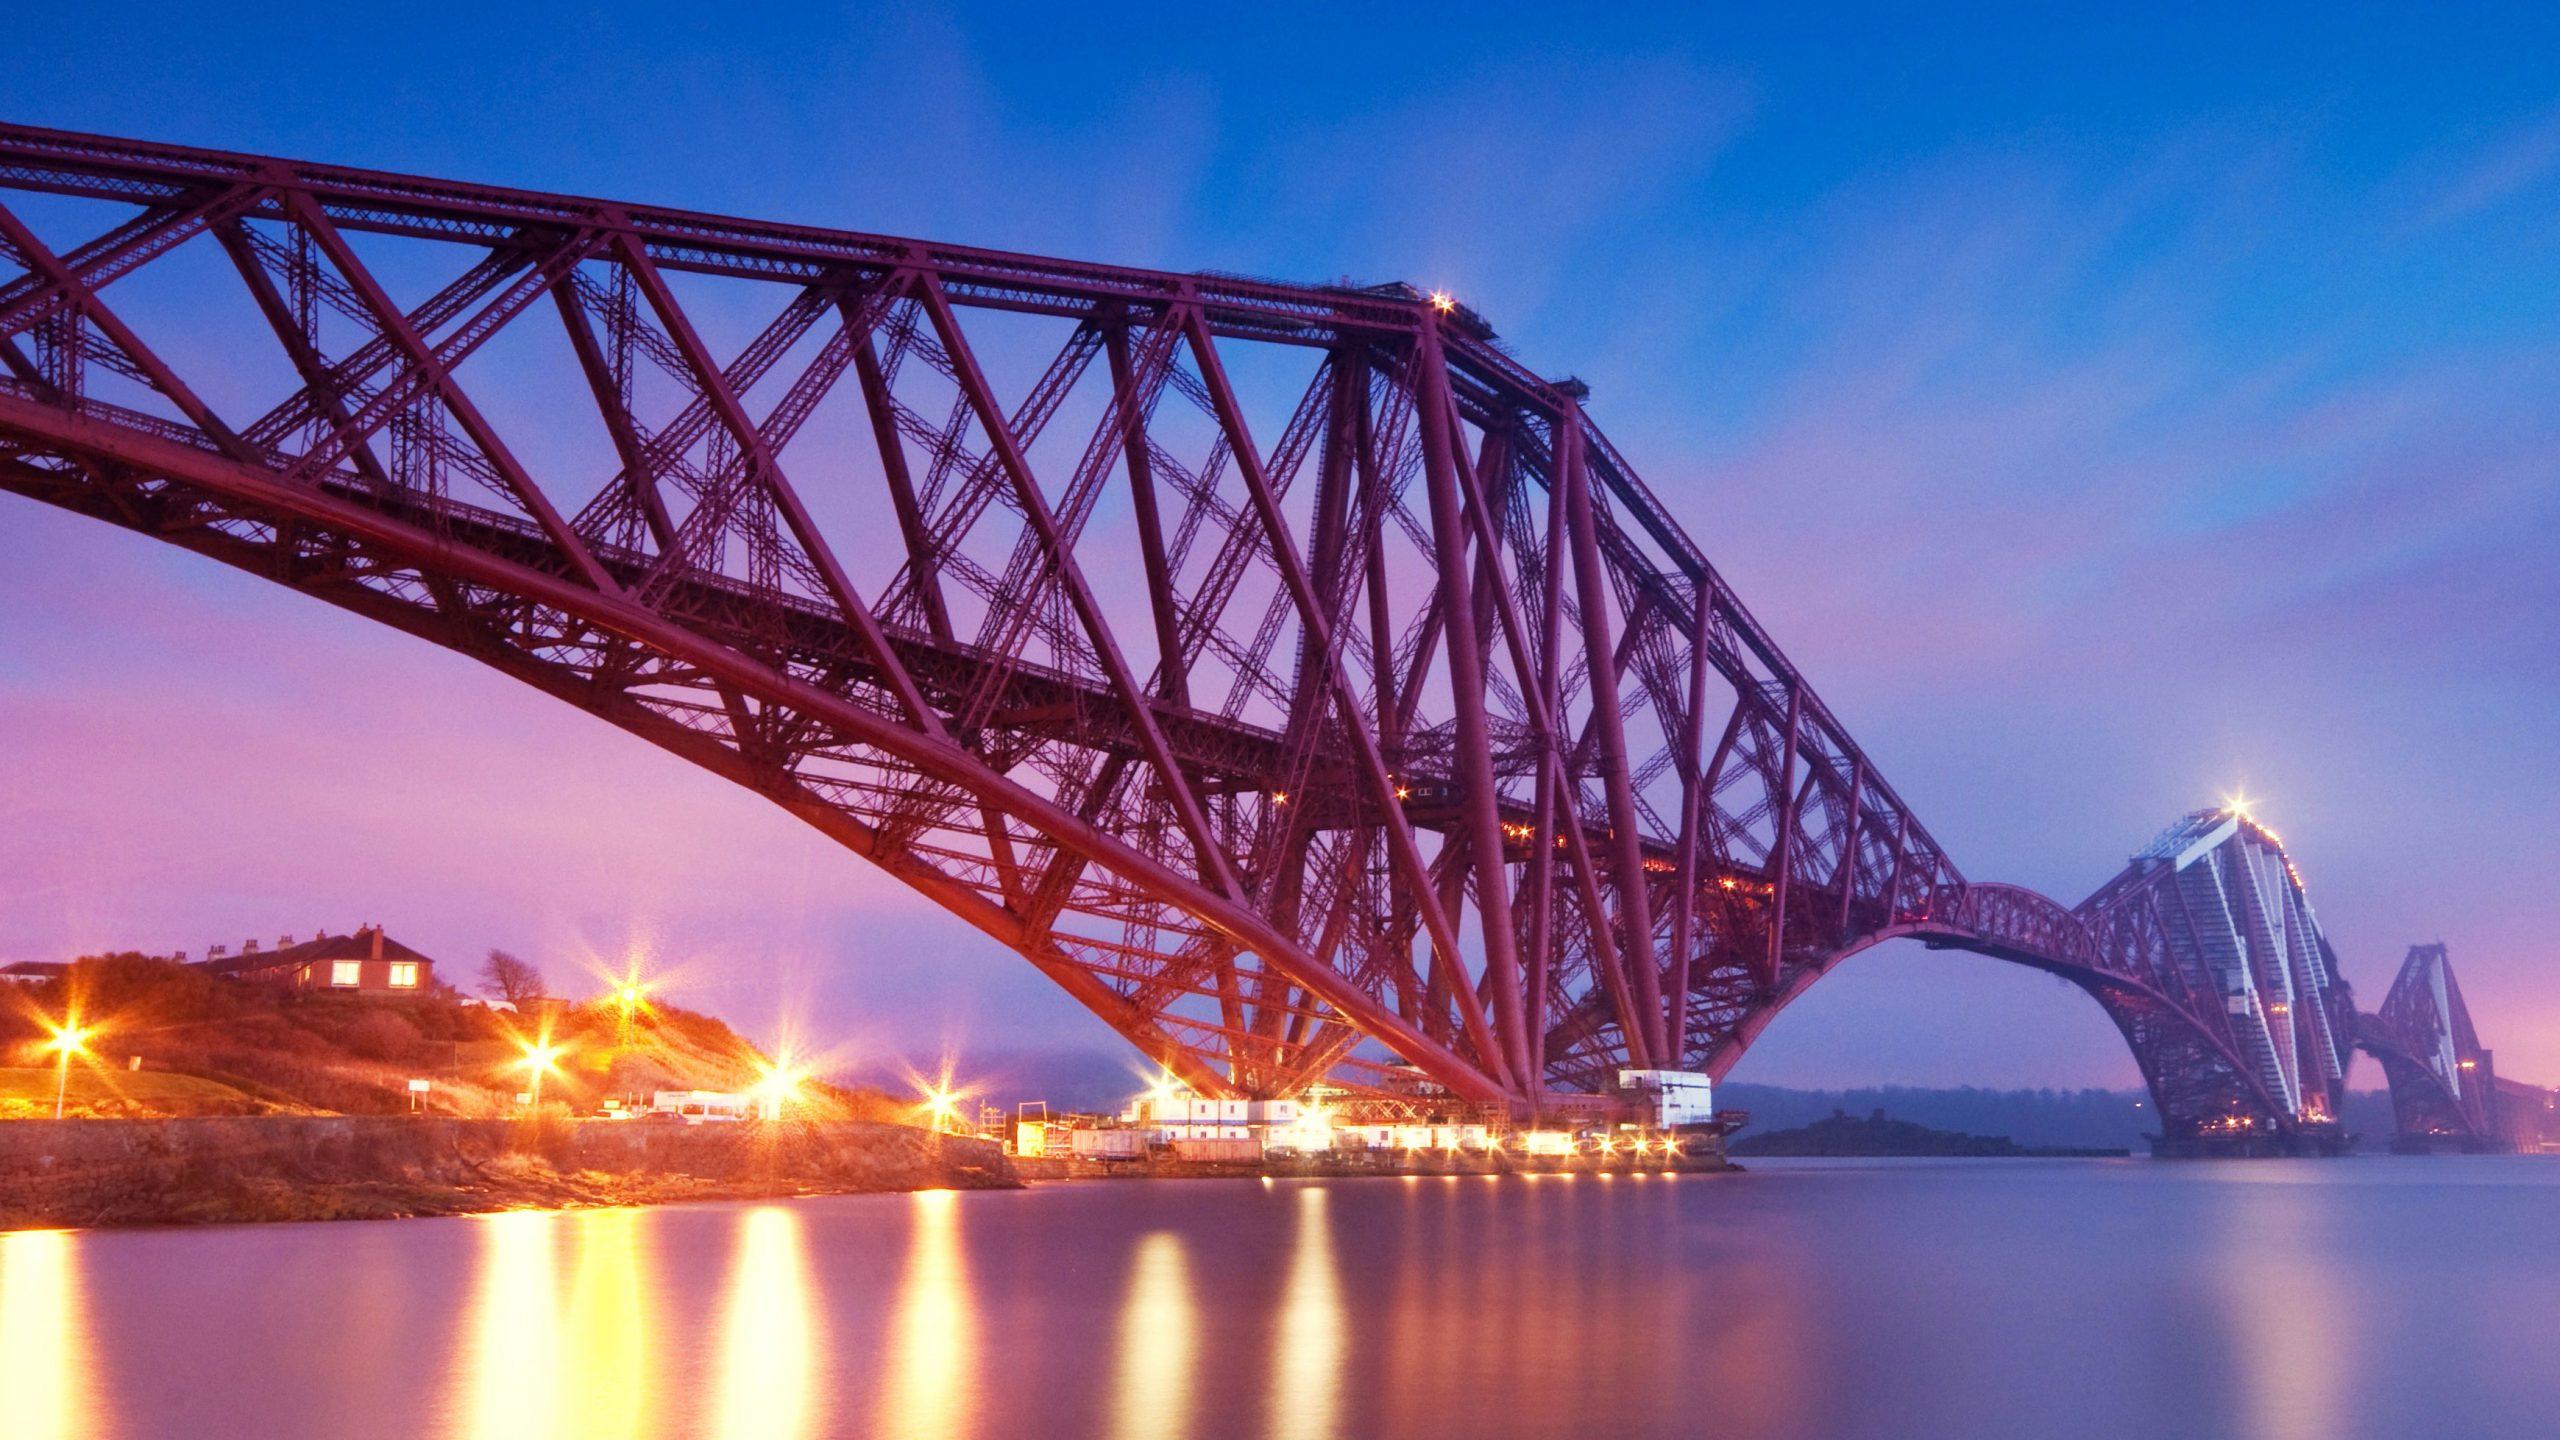 Forth Railway Bridge In The Evening buikt by Sir William Arrol & Co Ltd